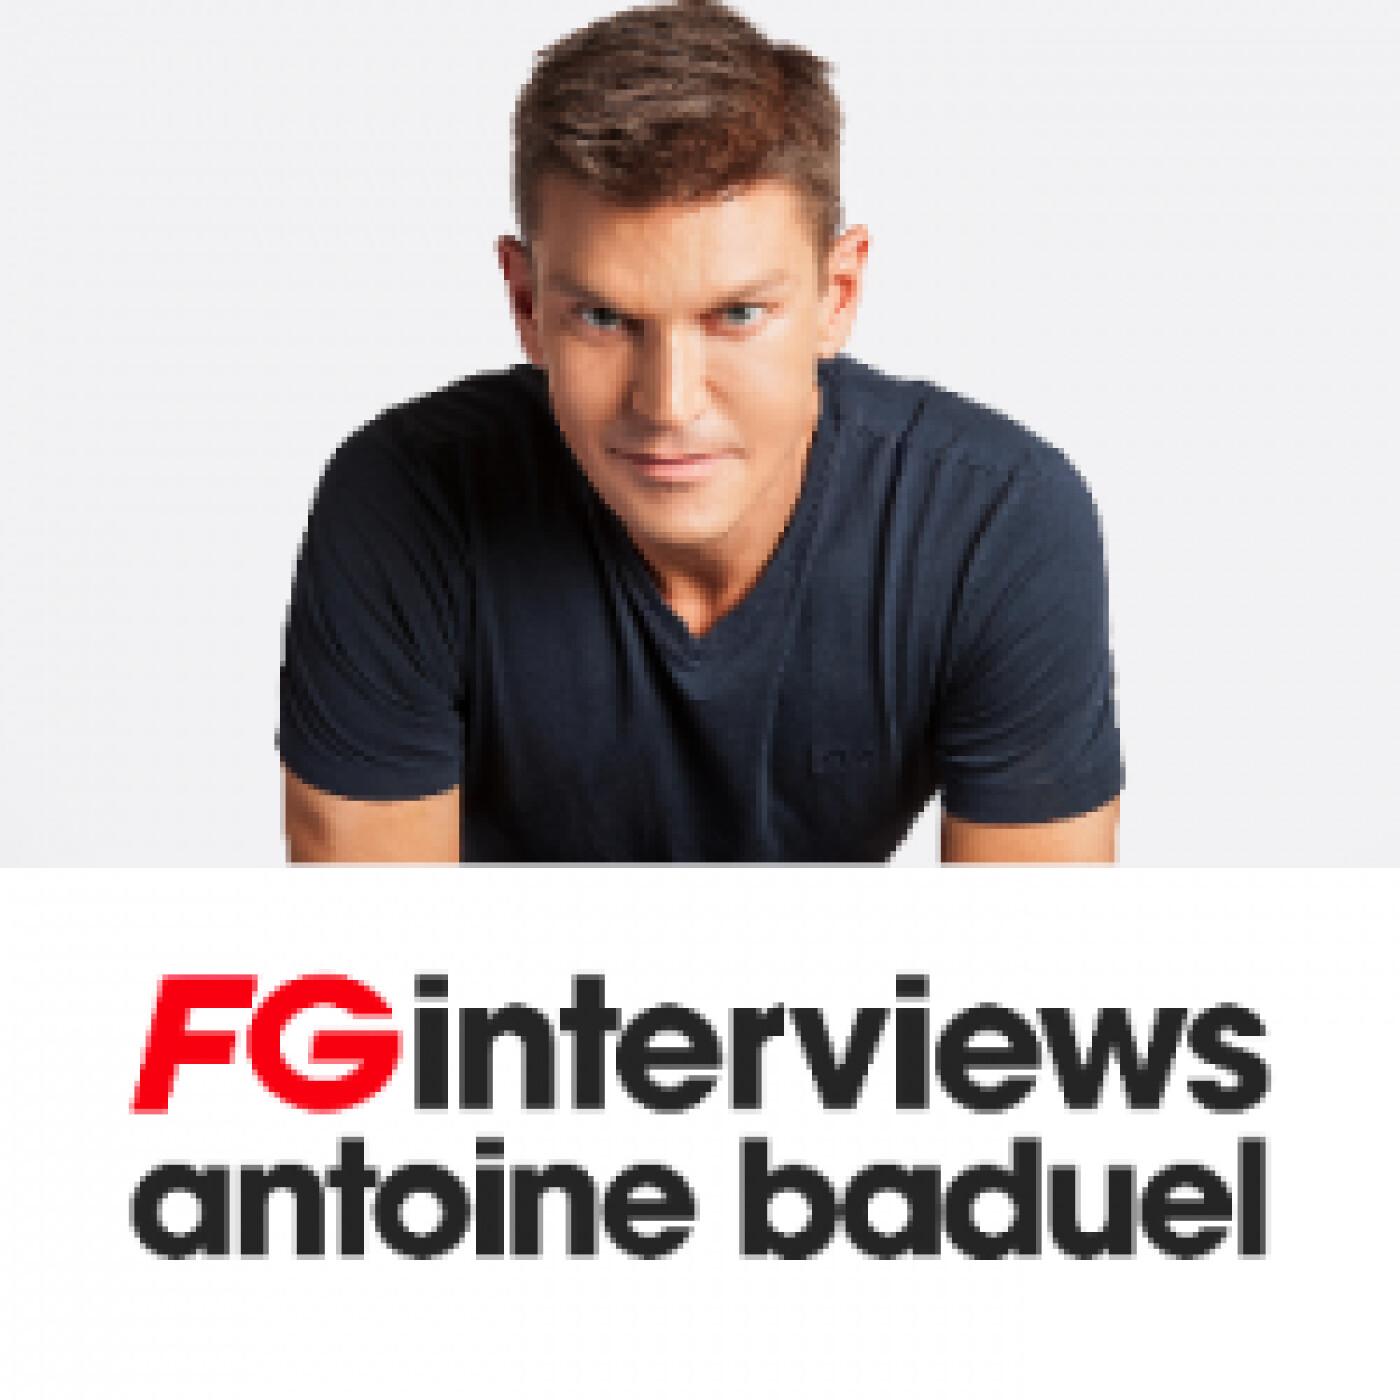 L'INTERVIEW DE MEDUZA DANS L'HAPPY HOUR FG